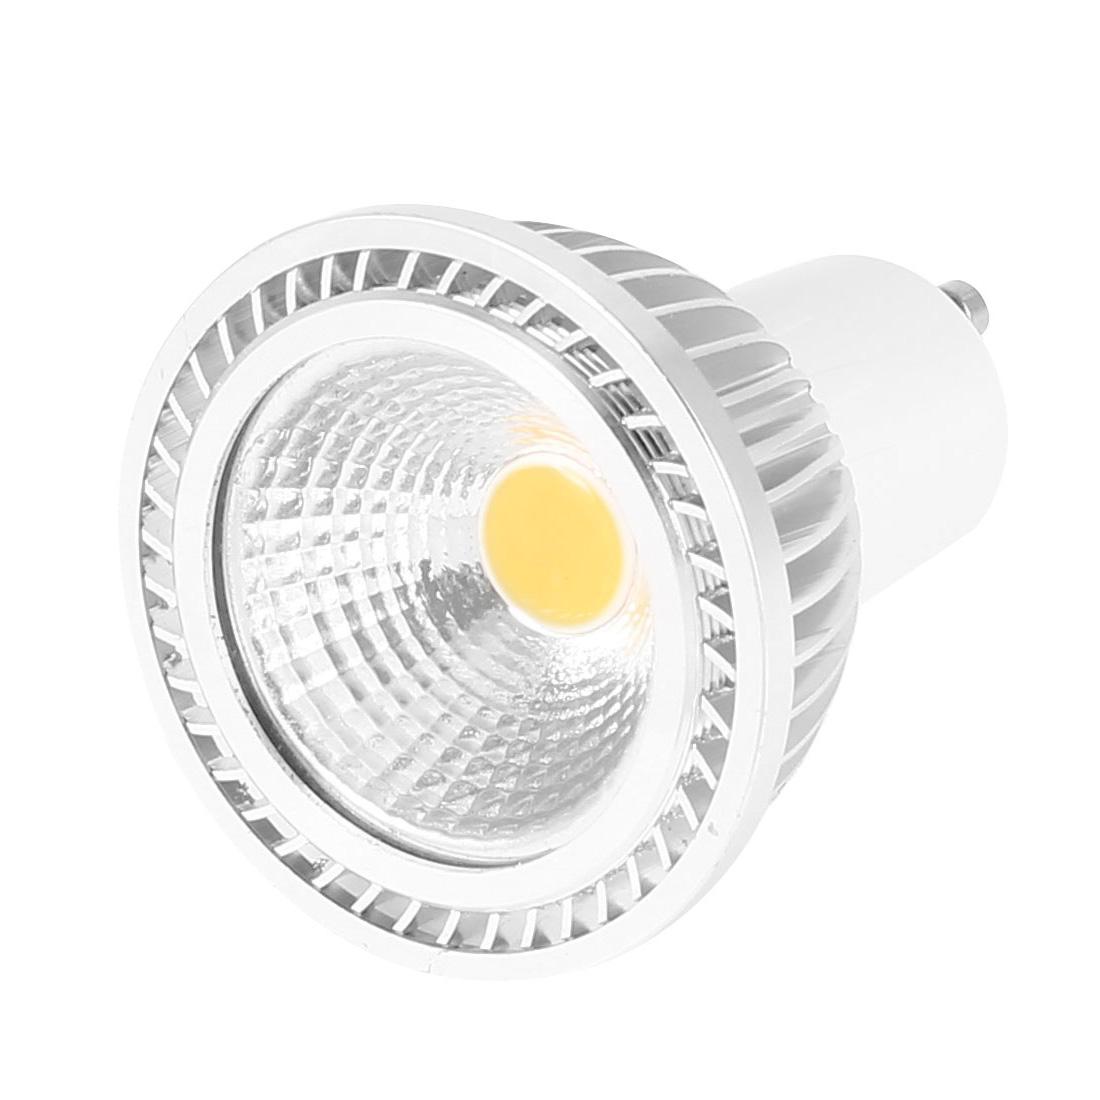 AC 85-265V GU10 3W Power Warm White LED Light Ceiling COB Spotlight Lamp Bulb